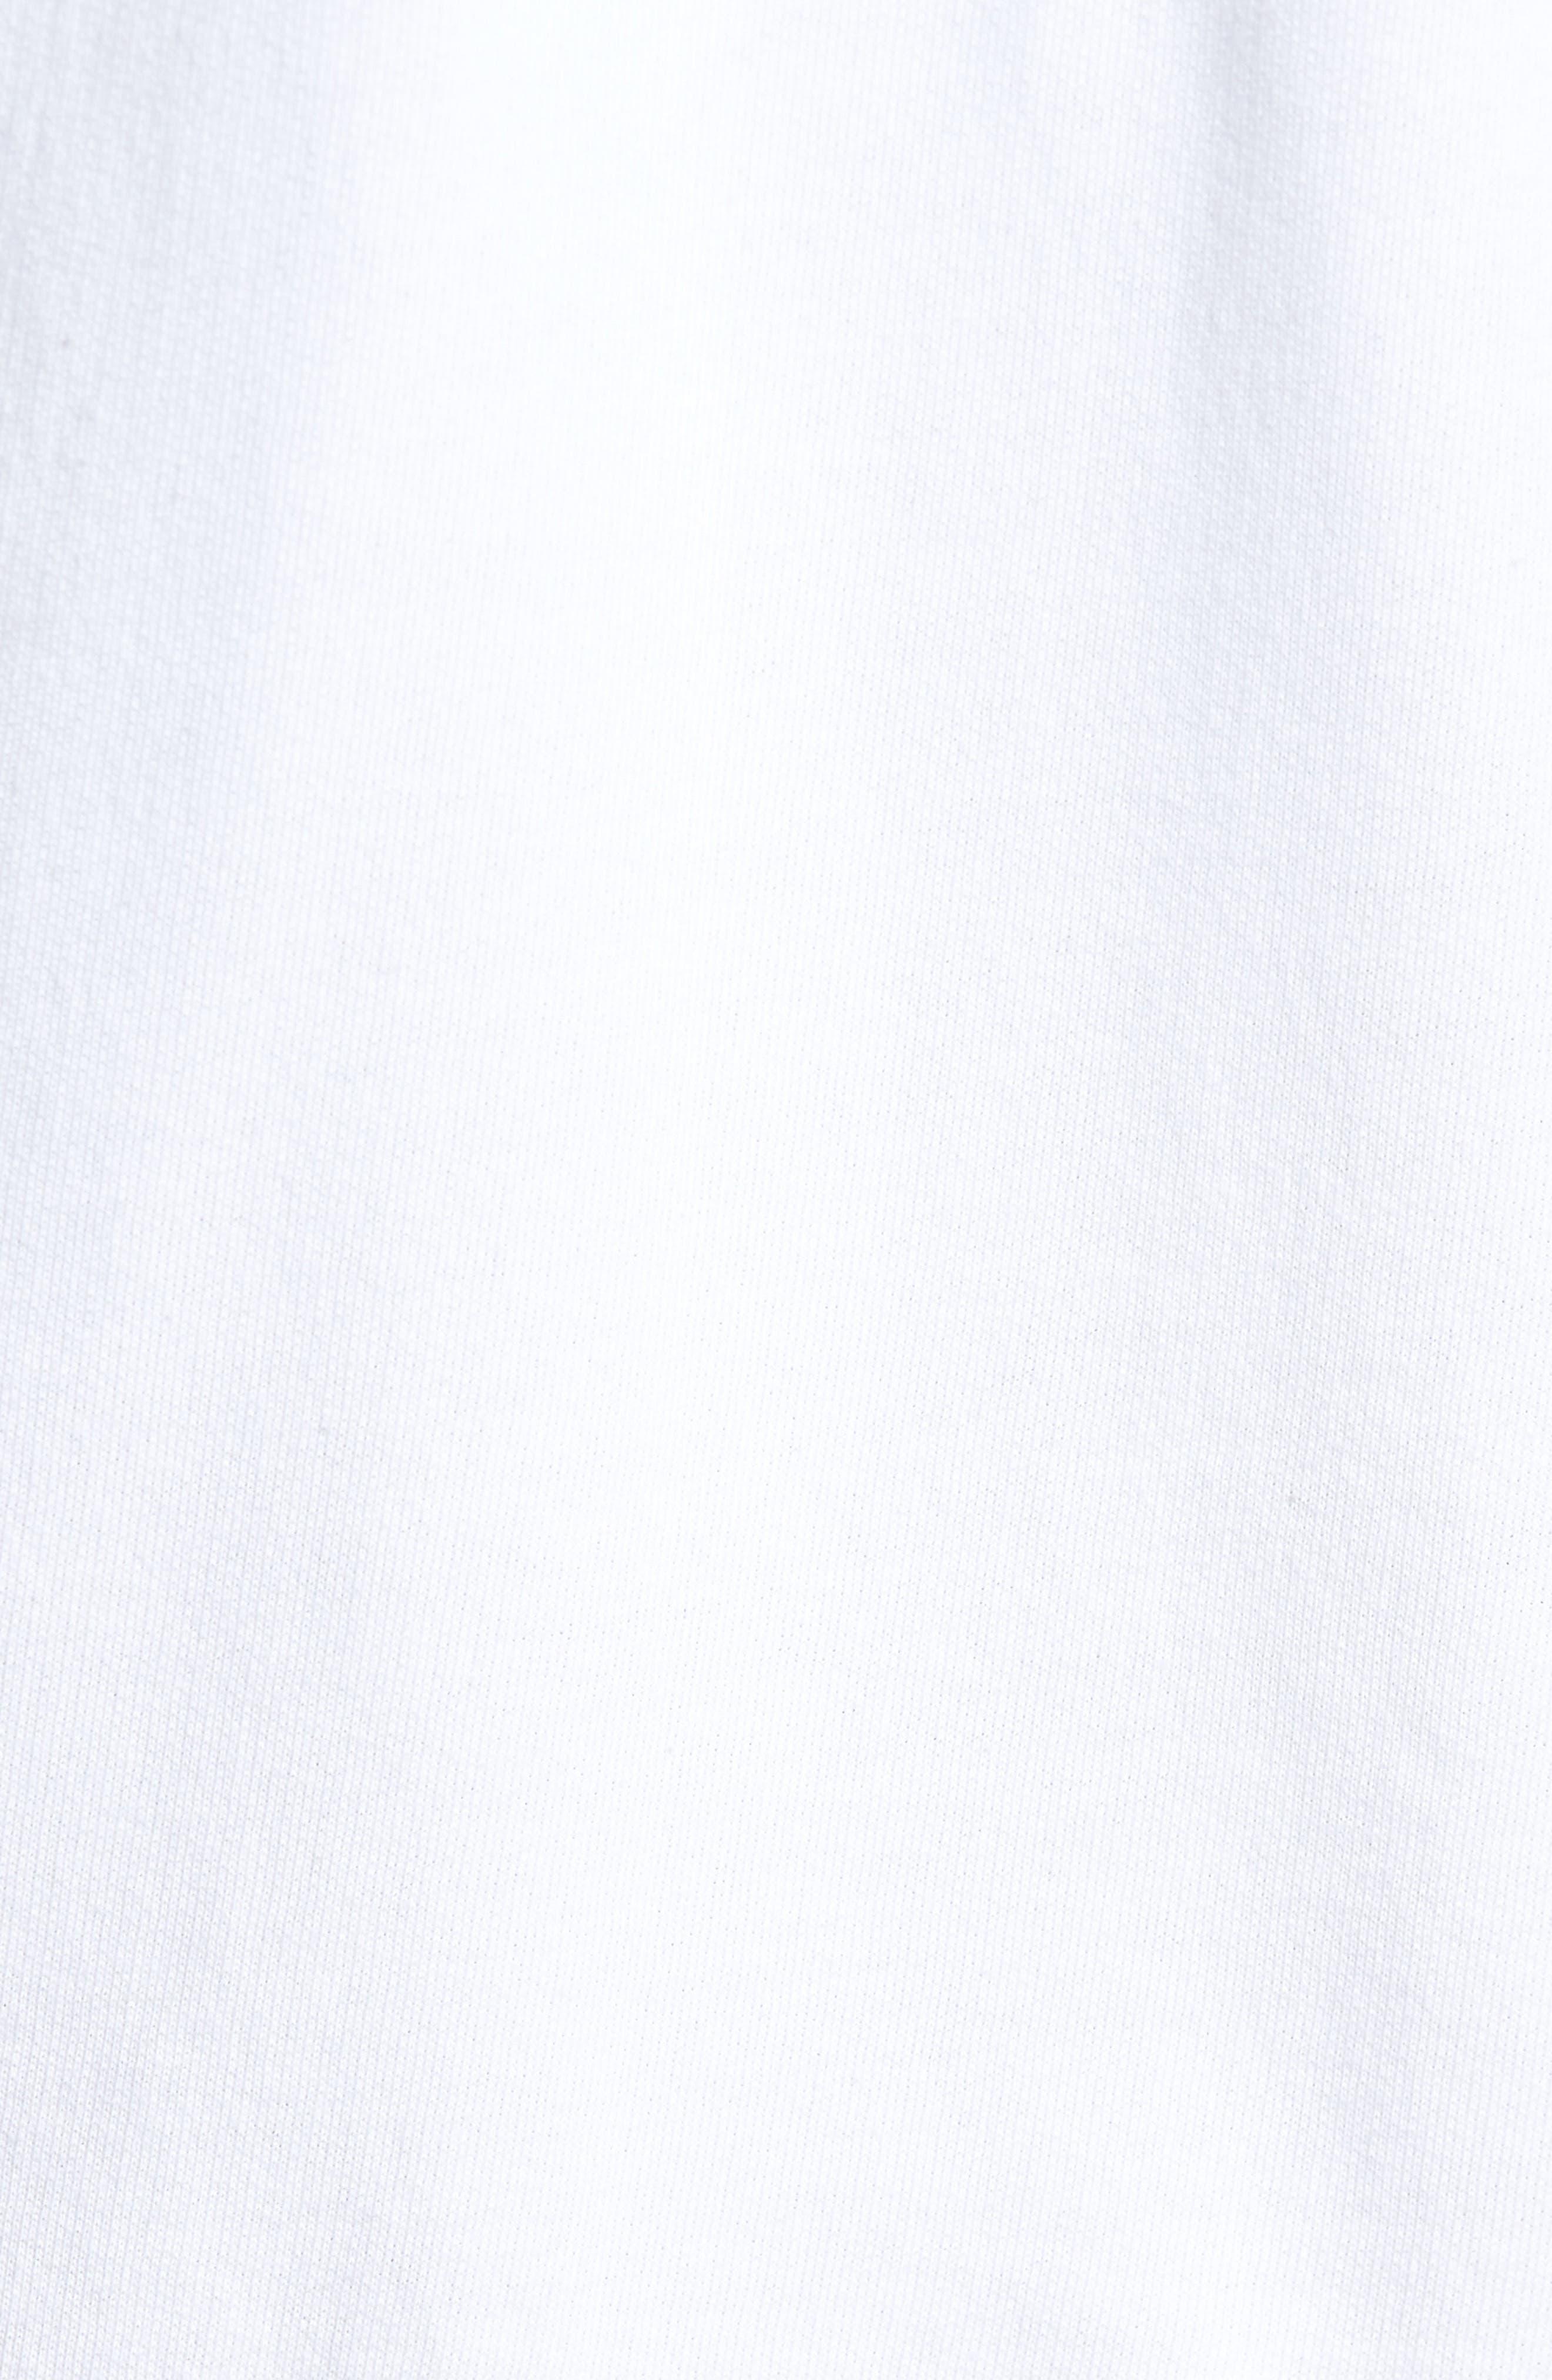 Atomatic Quarter-Zip Fleece Pullover,                             Alternate thumbnail 5, color,                             100